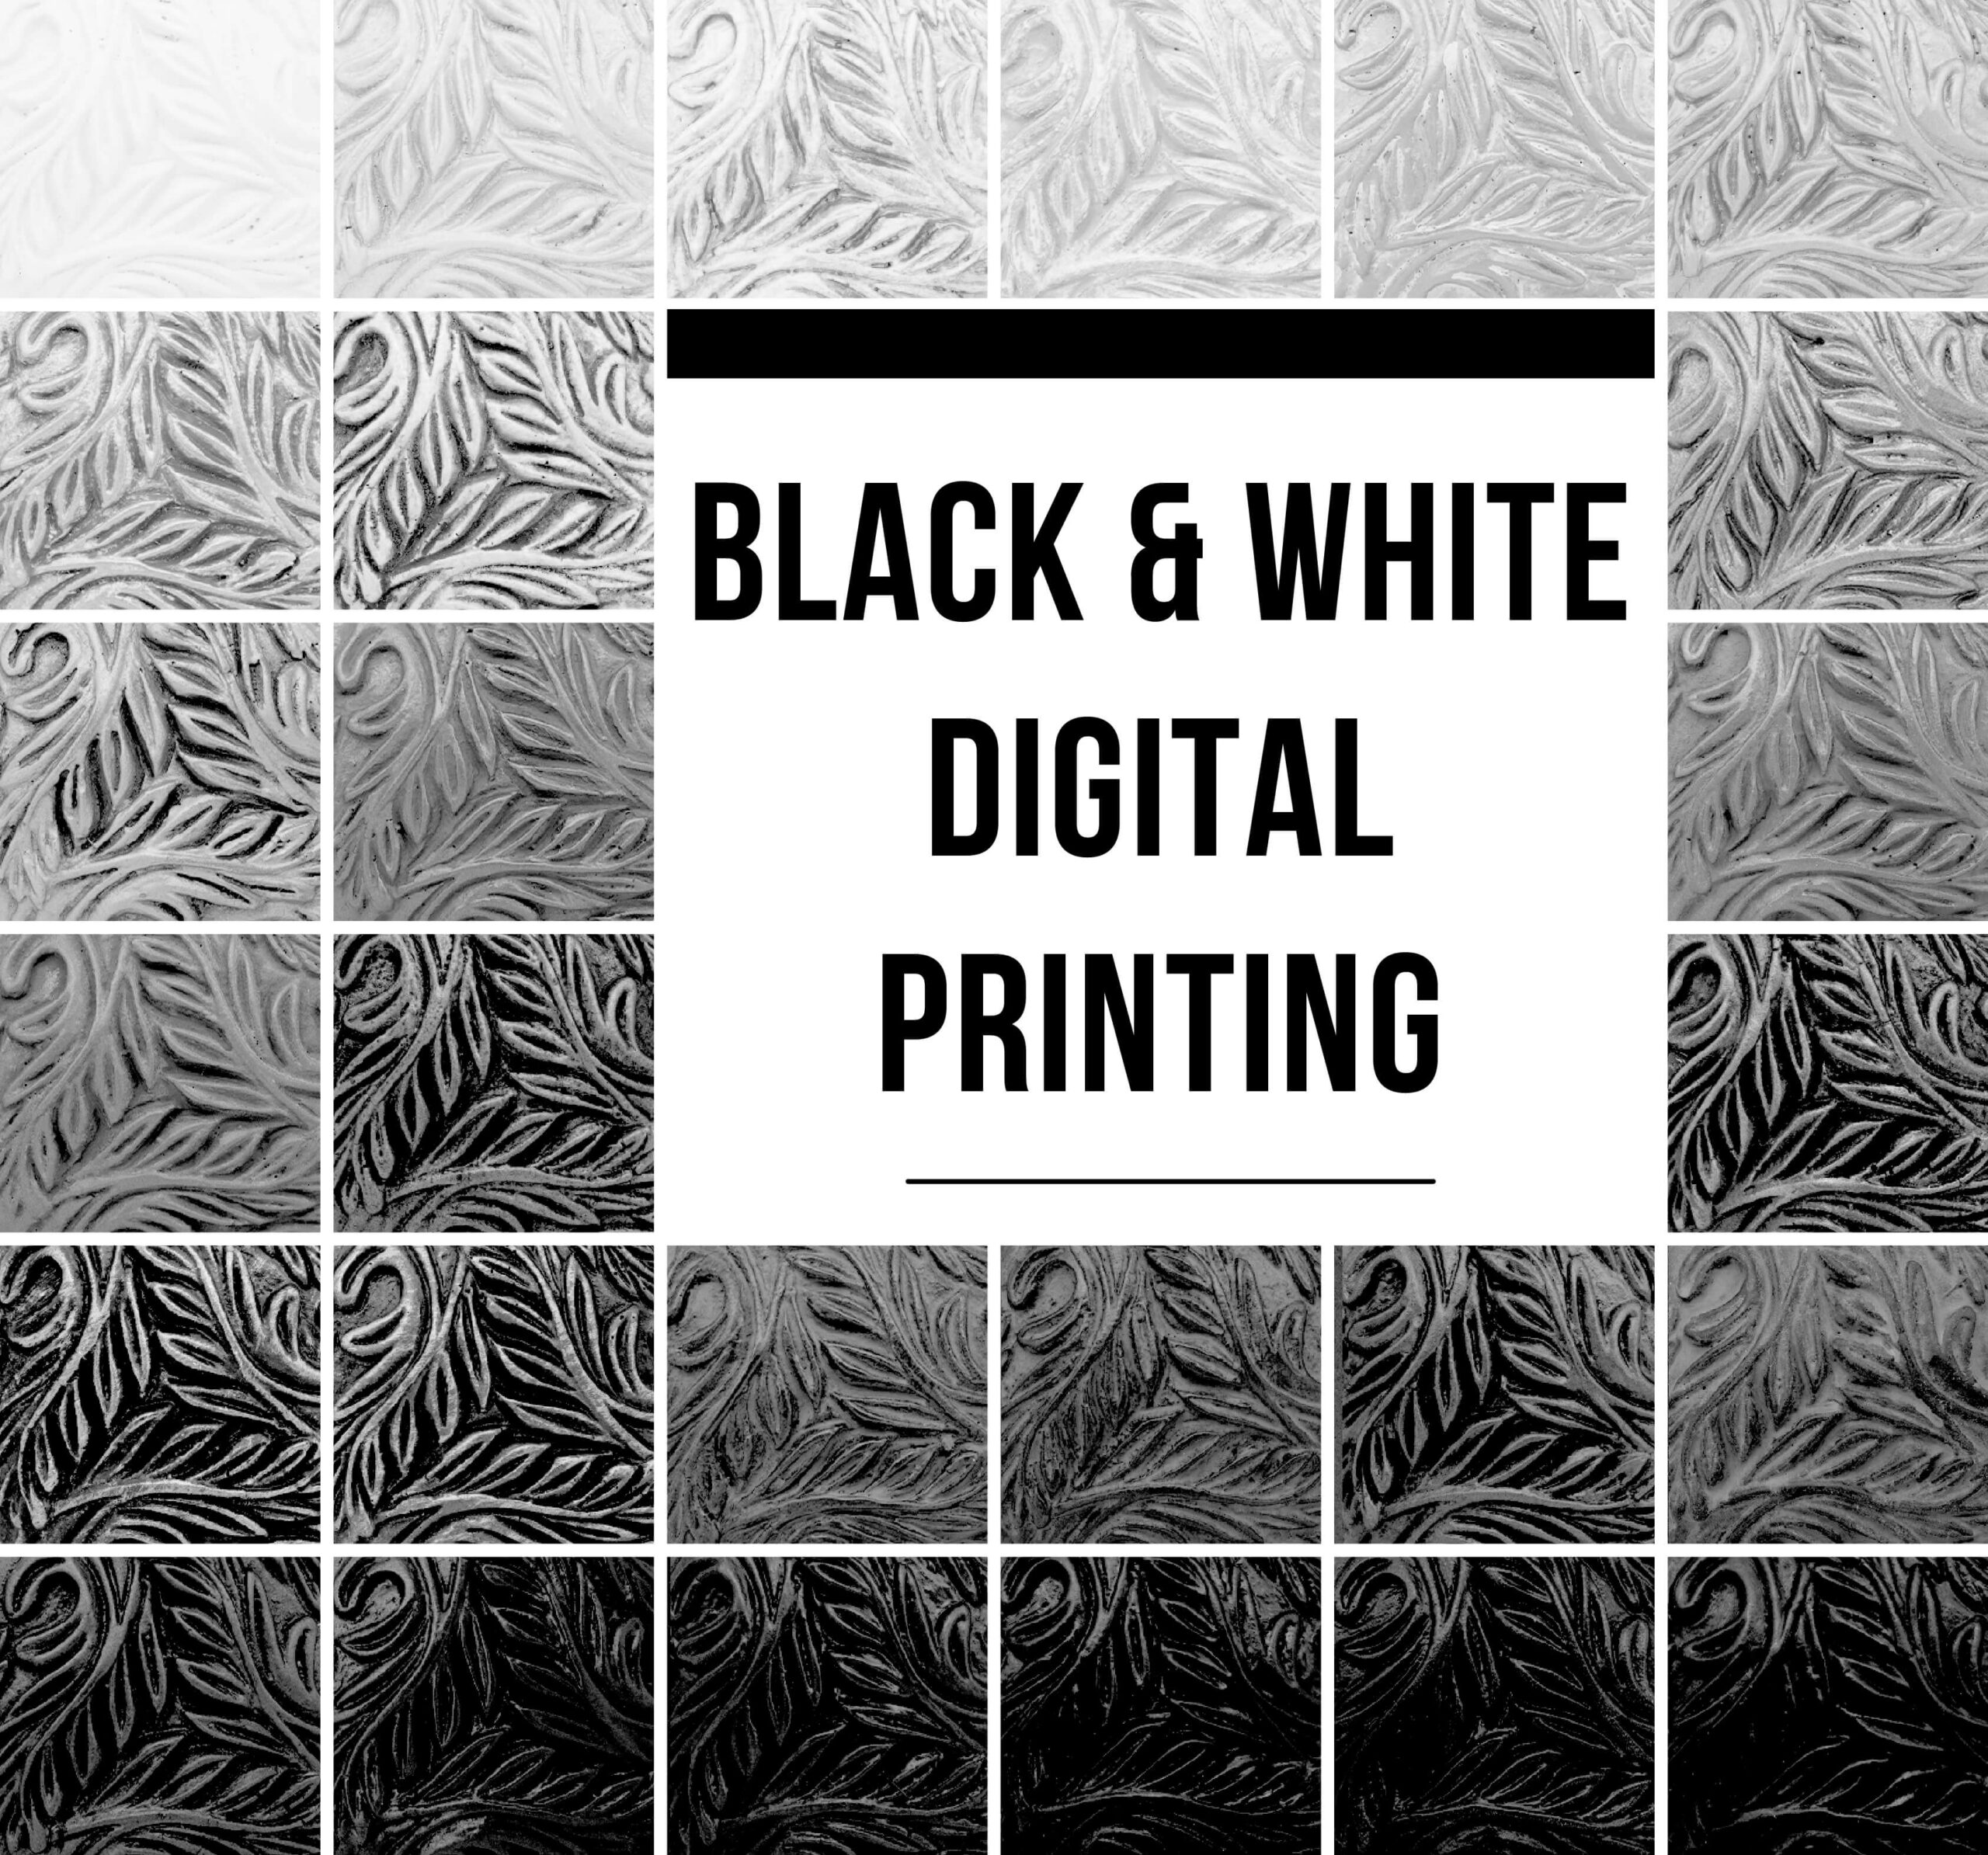 , Dave The Printer